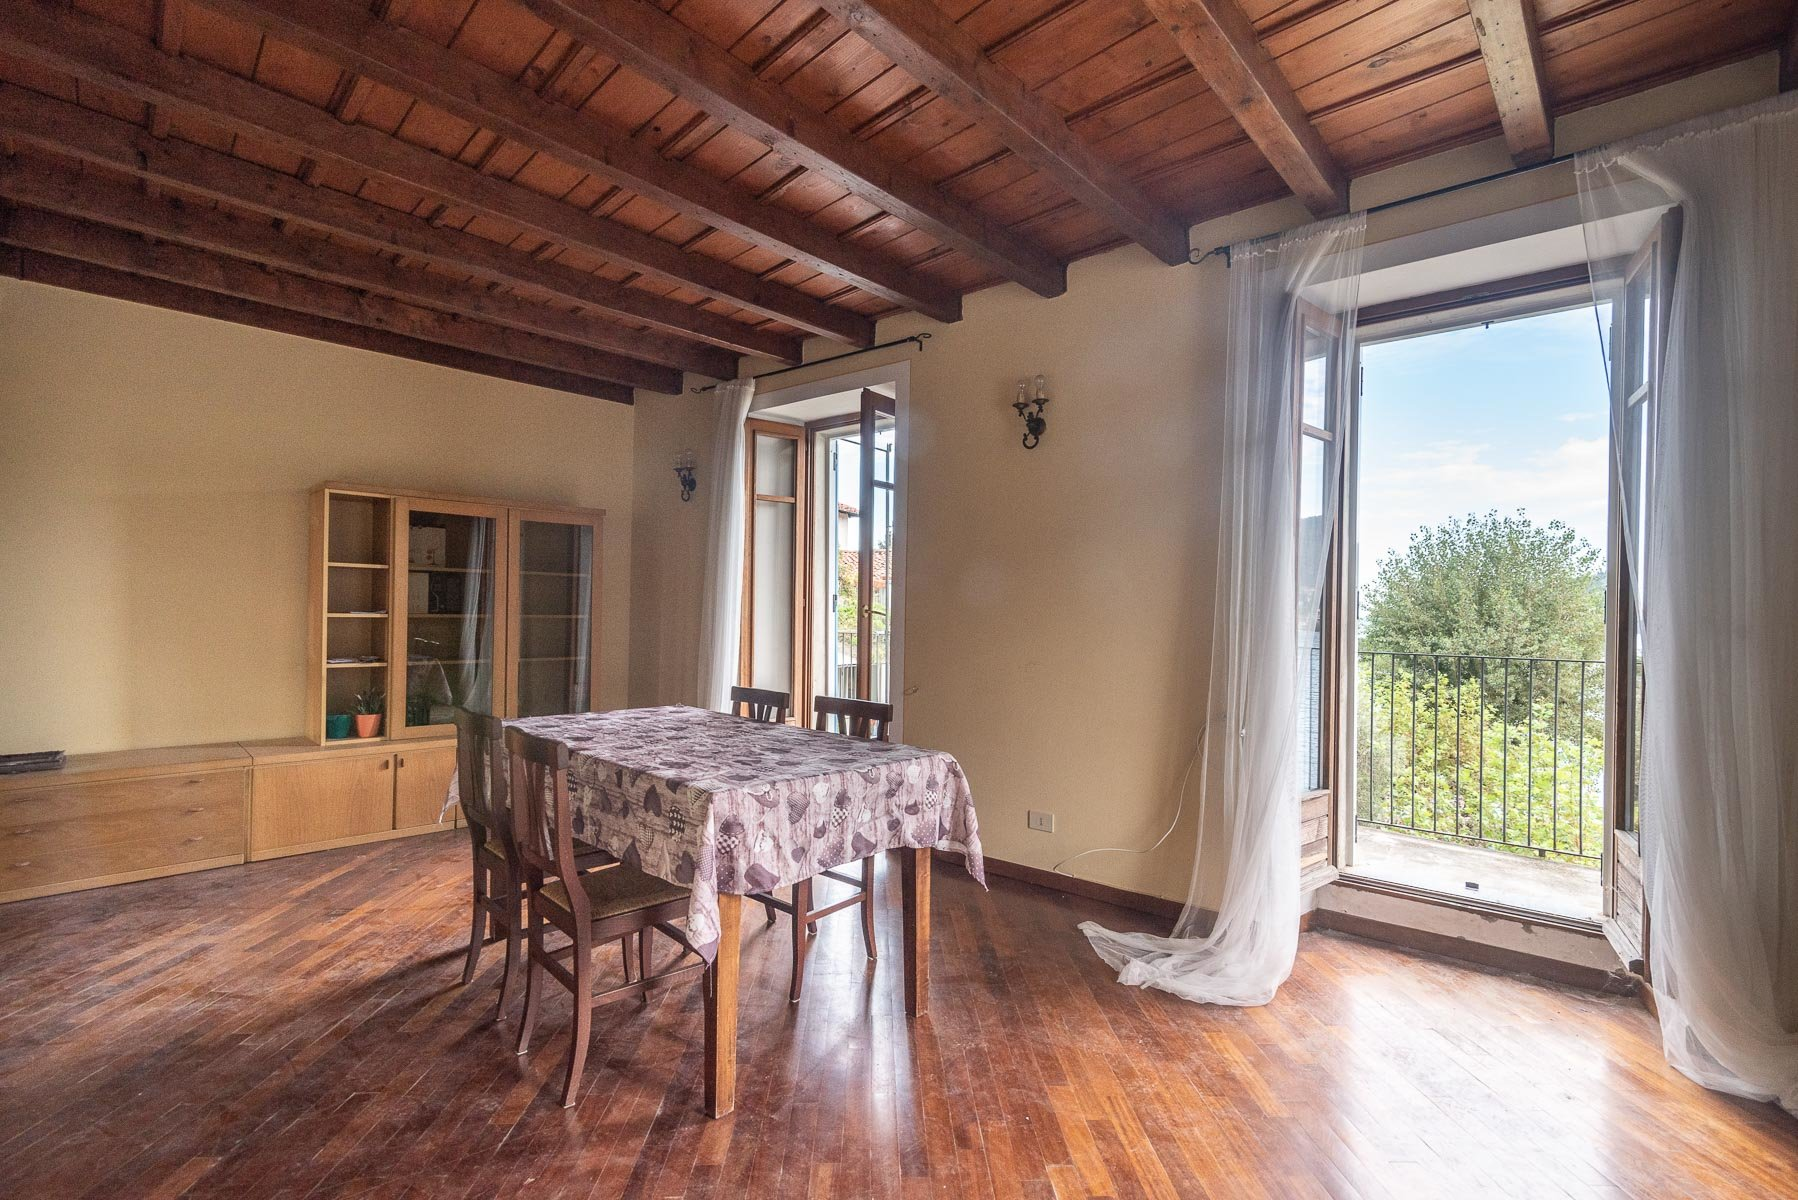 Apartment for sale in Pescatori island,Stresa-dining room